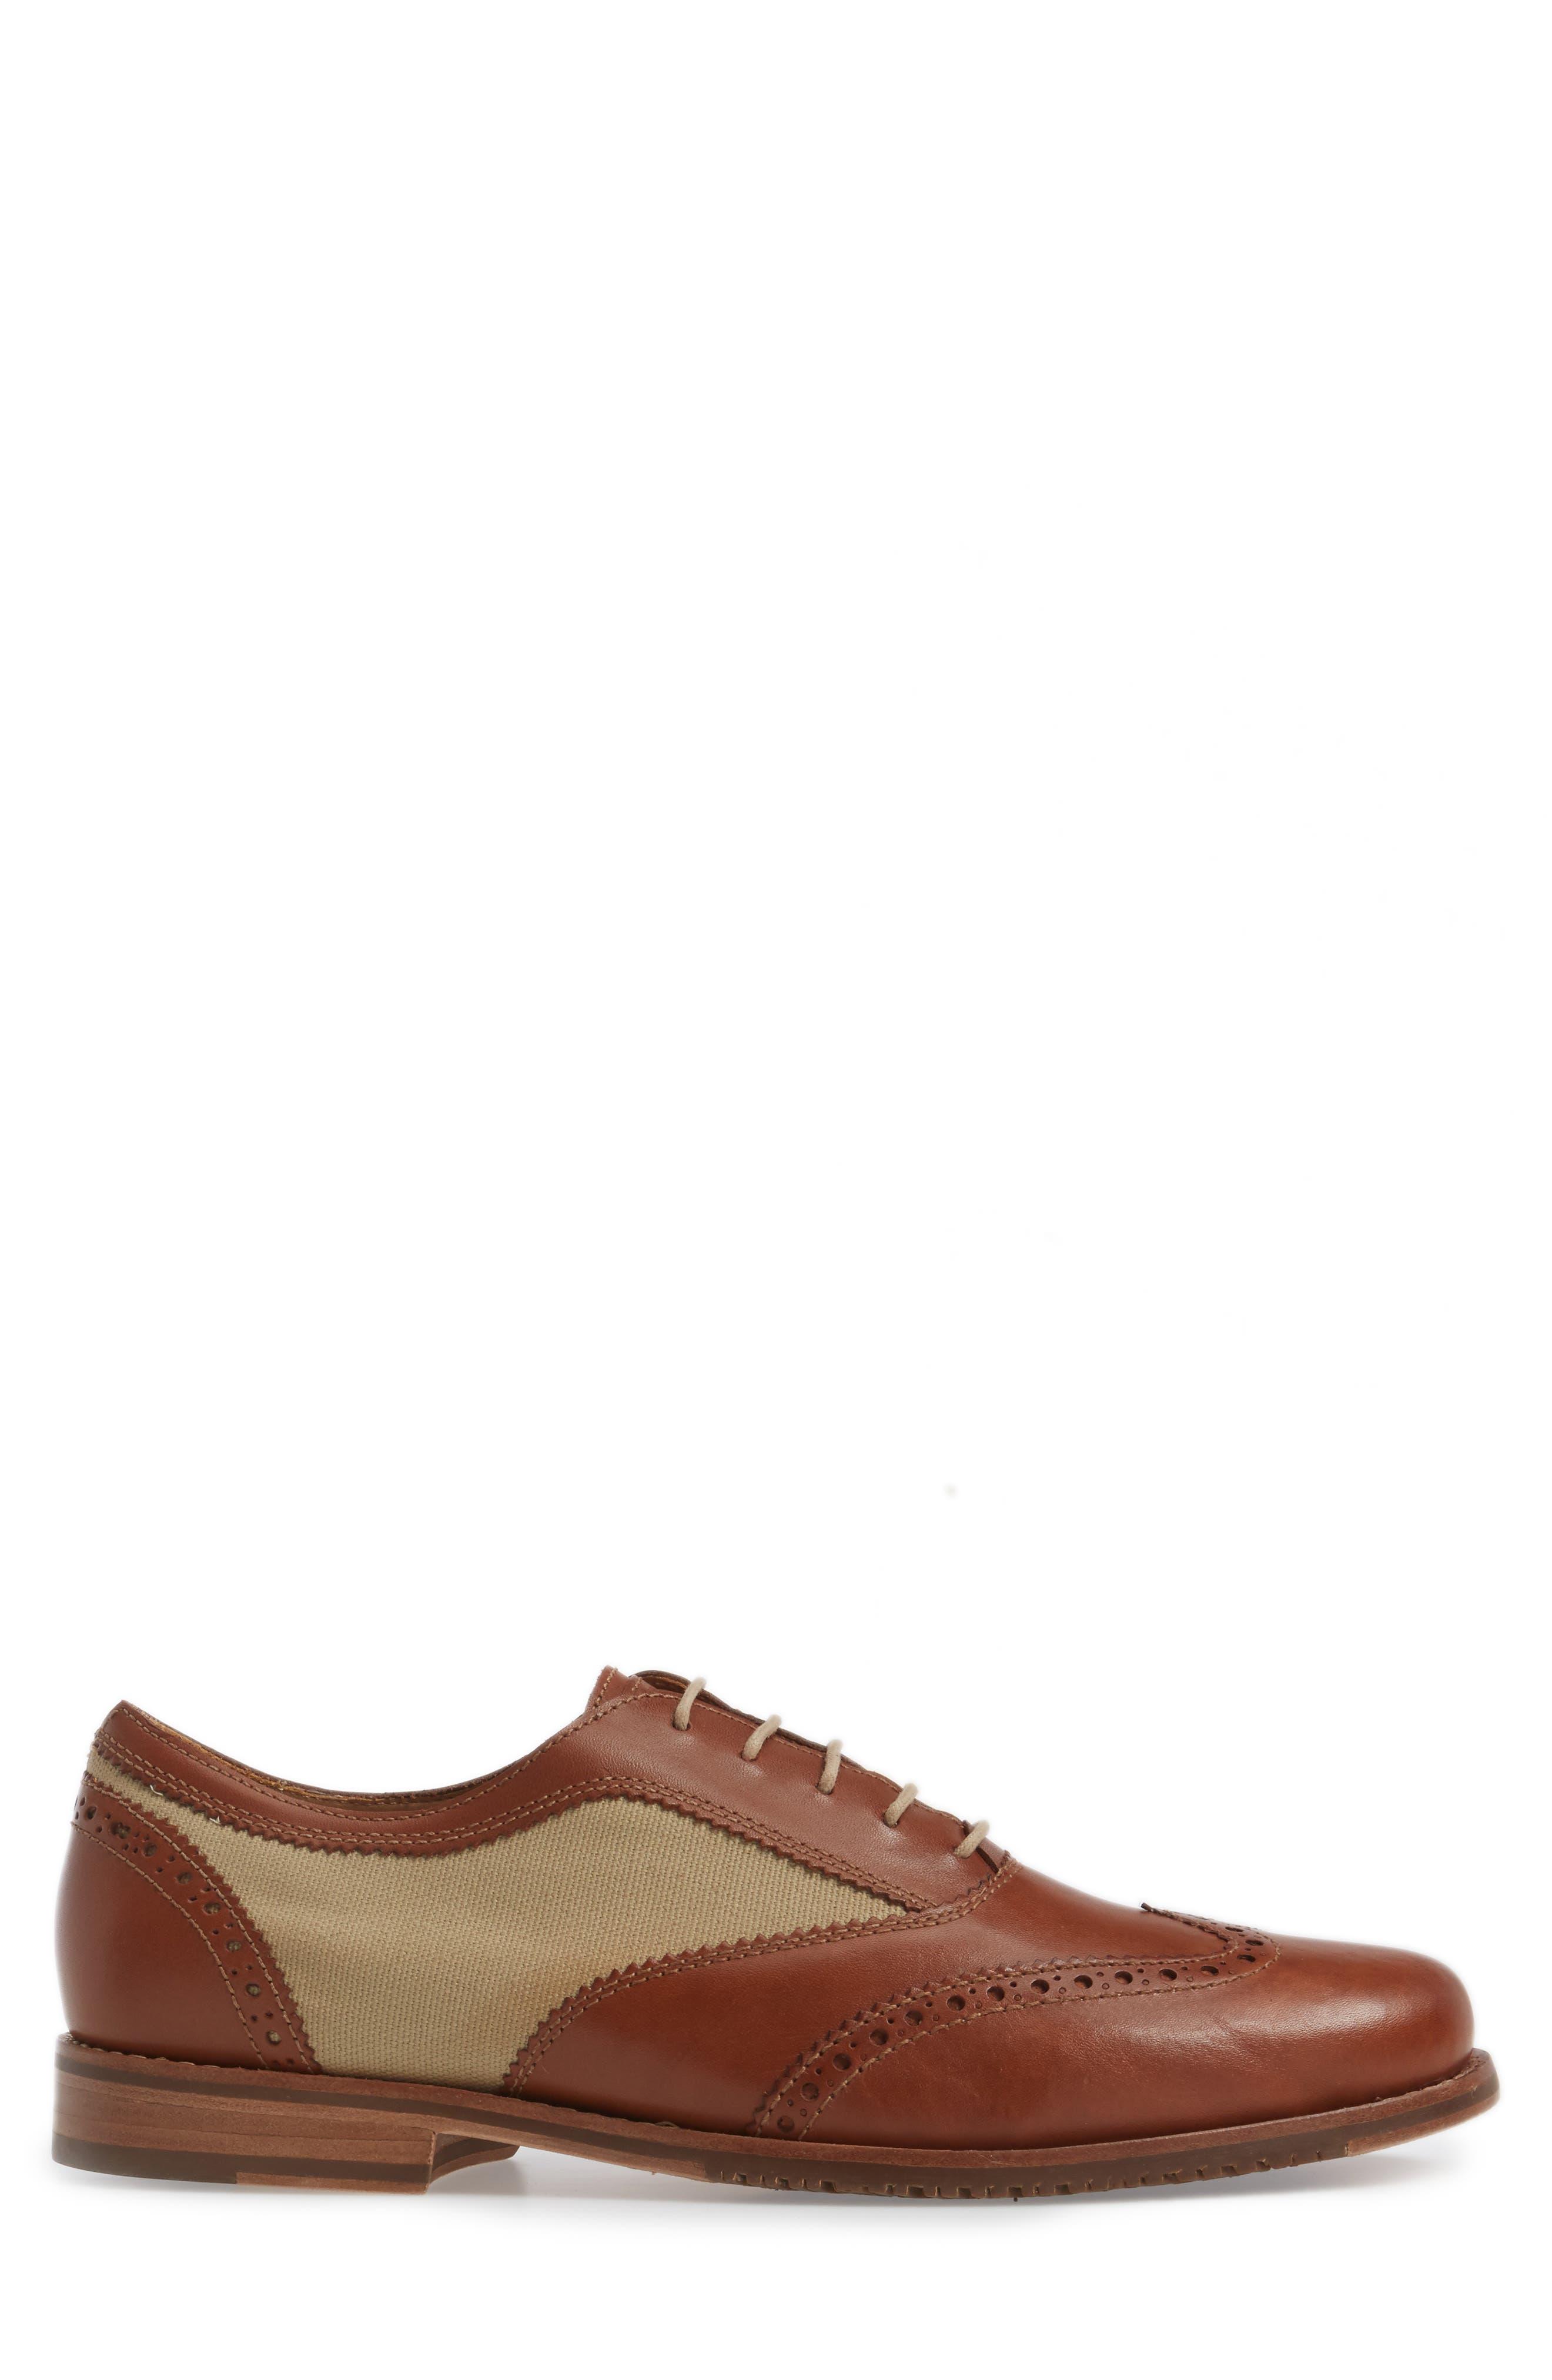 Felman Wingtip,                             Alternate thumbnail 3, color,                             Whiskey Leather